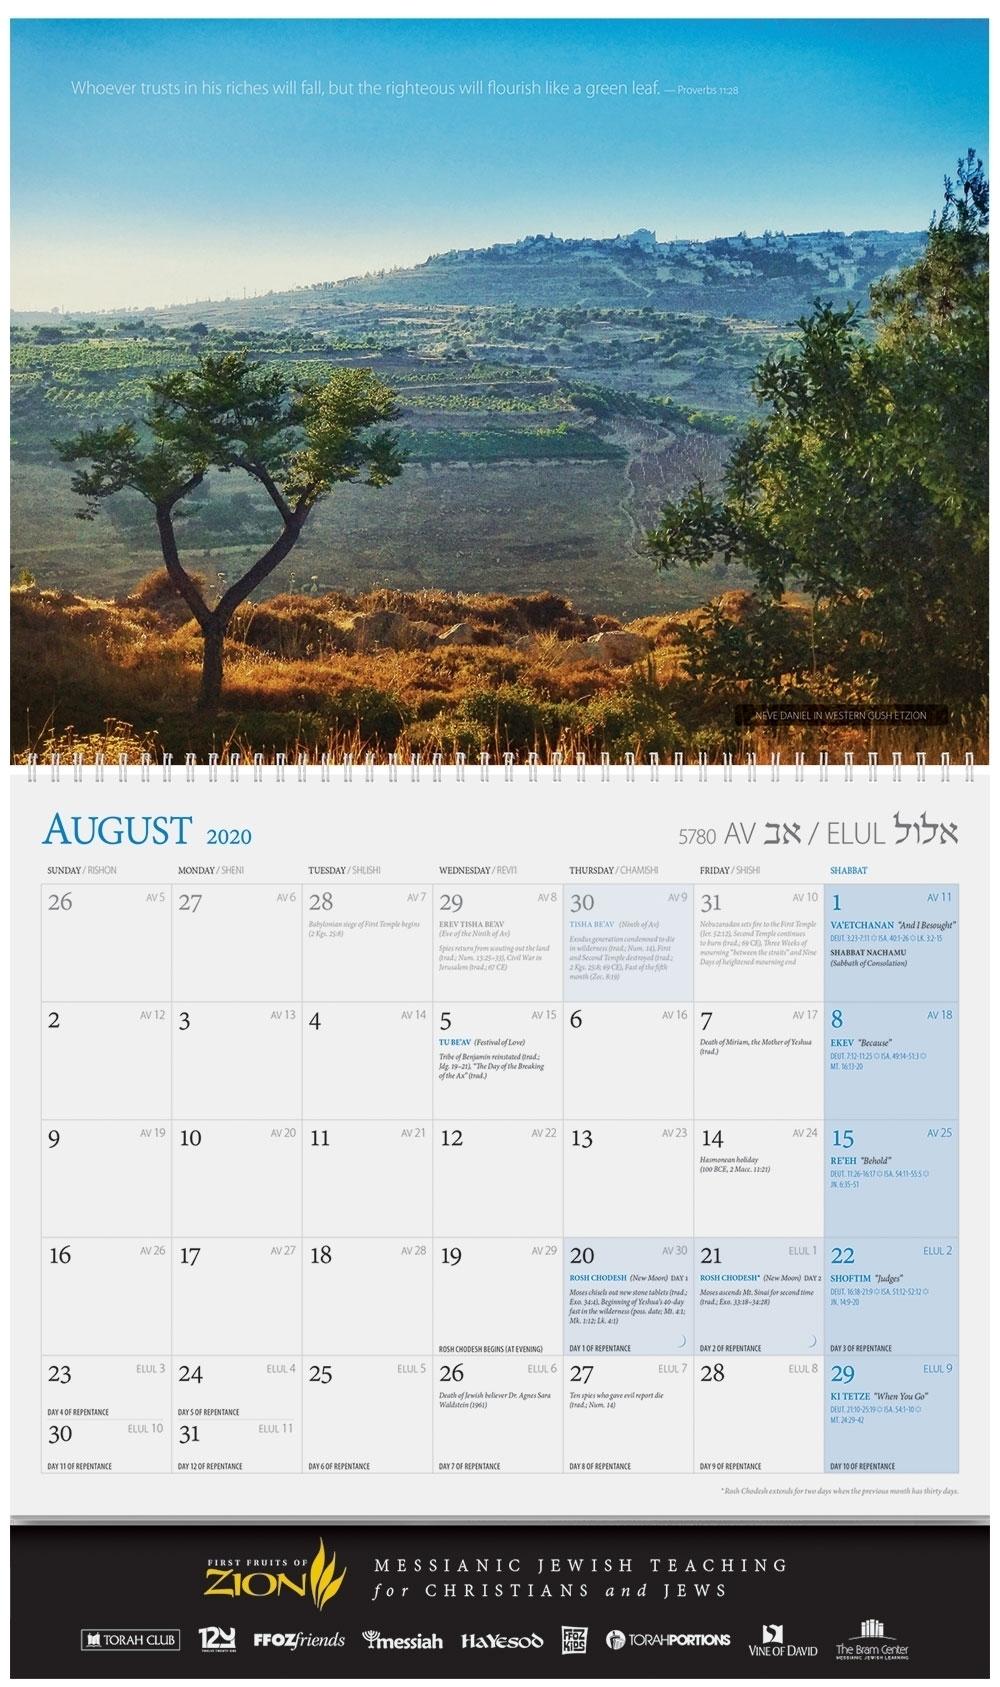 Weekly Torah Parsha Calendar For 2019/2020 - Calendar inside 2019 Calendar Of Torah Portions